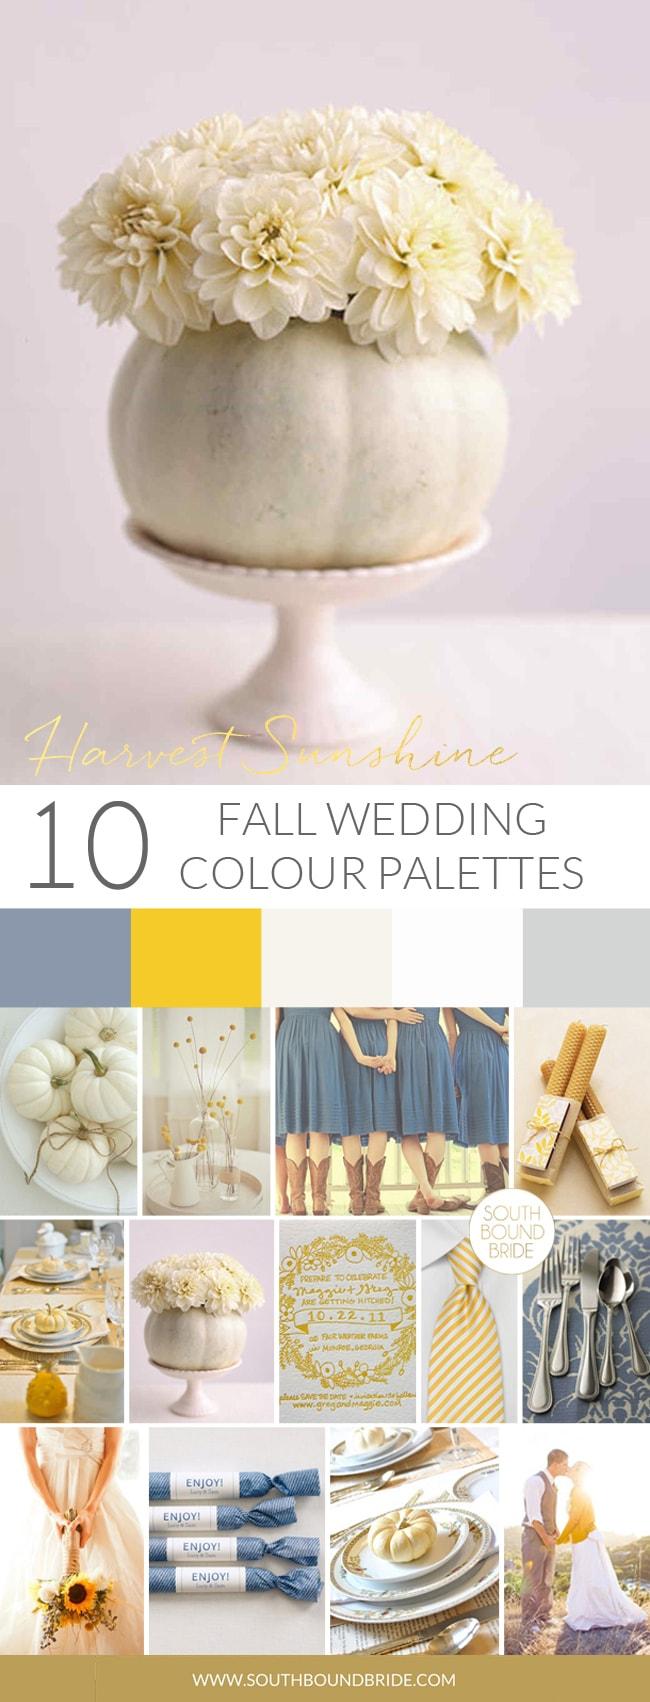 Harvest Sunshine Fall Wedding Palette | SouthBound Bride